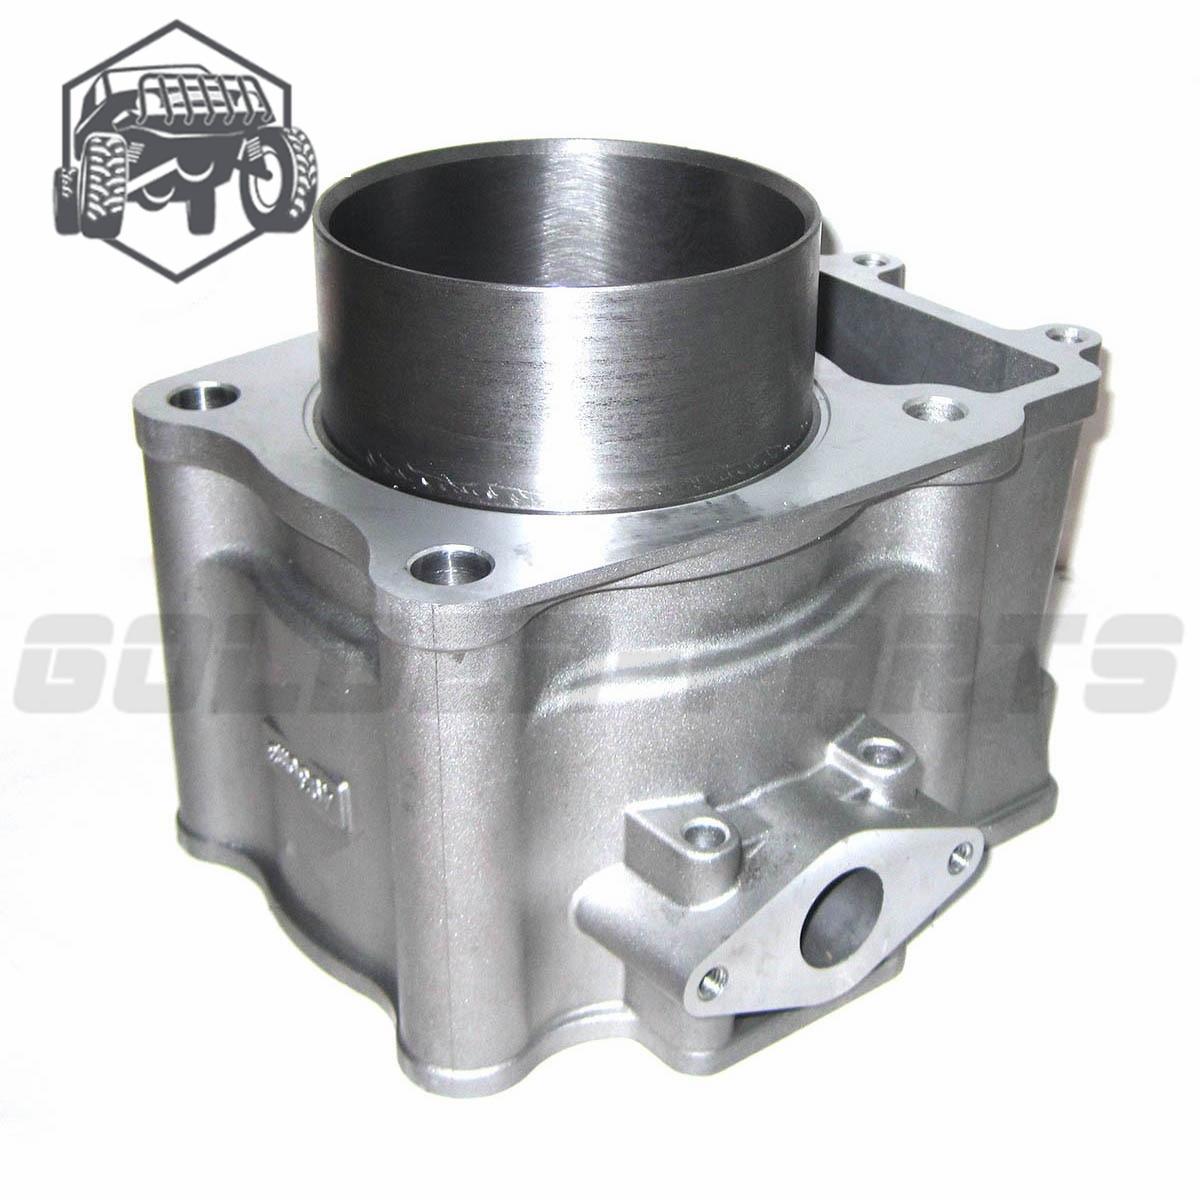 87.5mm Cylinder Piston Gasket Kit For CFMOTO CF188 500 CF500 500CC UTV ATV GO KART 0180-023100 enlarge